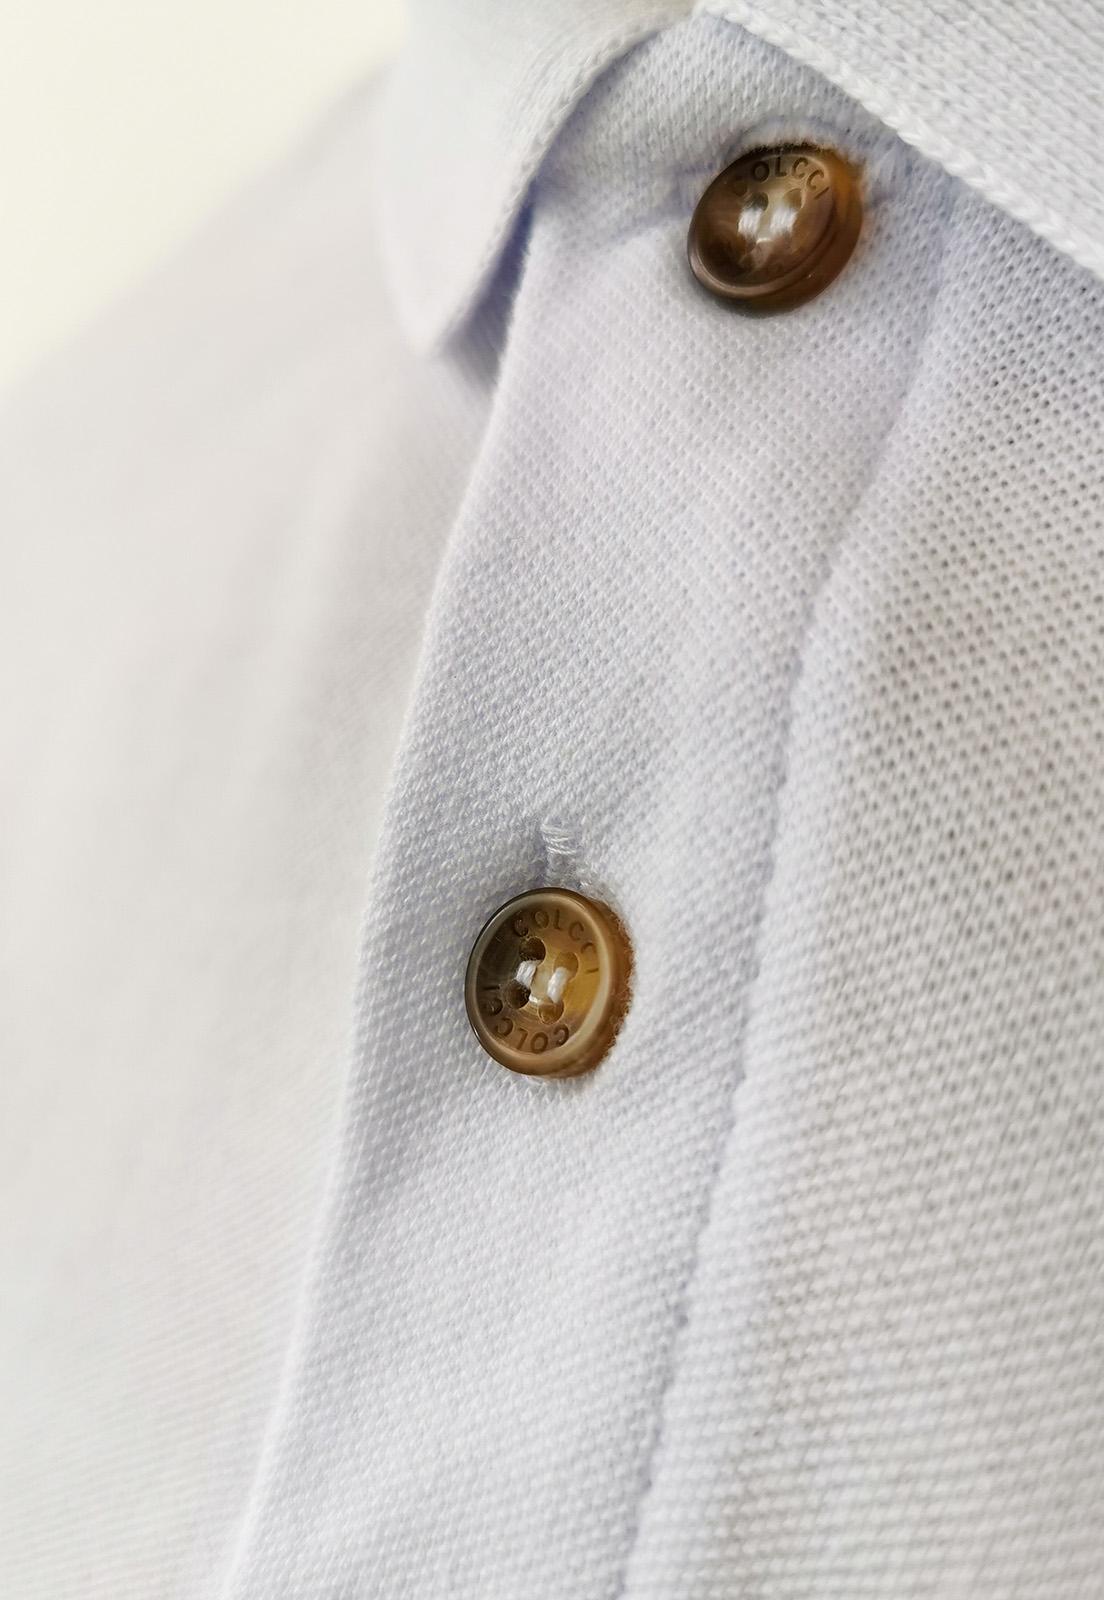 Camisa Gola Polo Colcci Branca Lisa